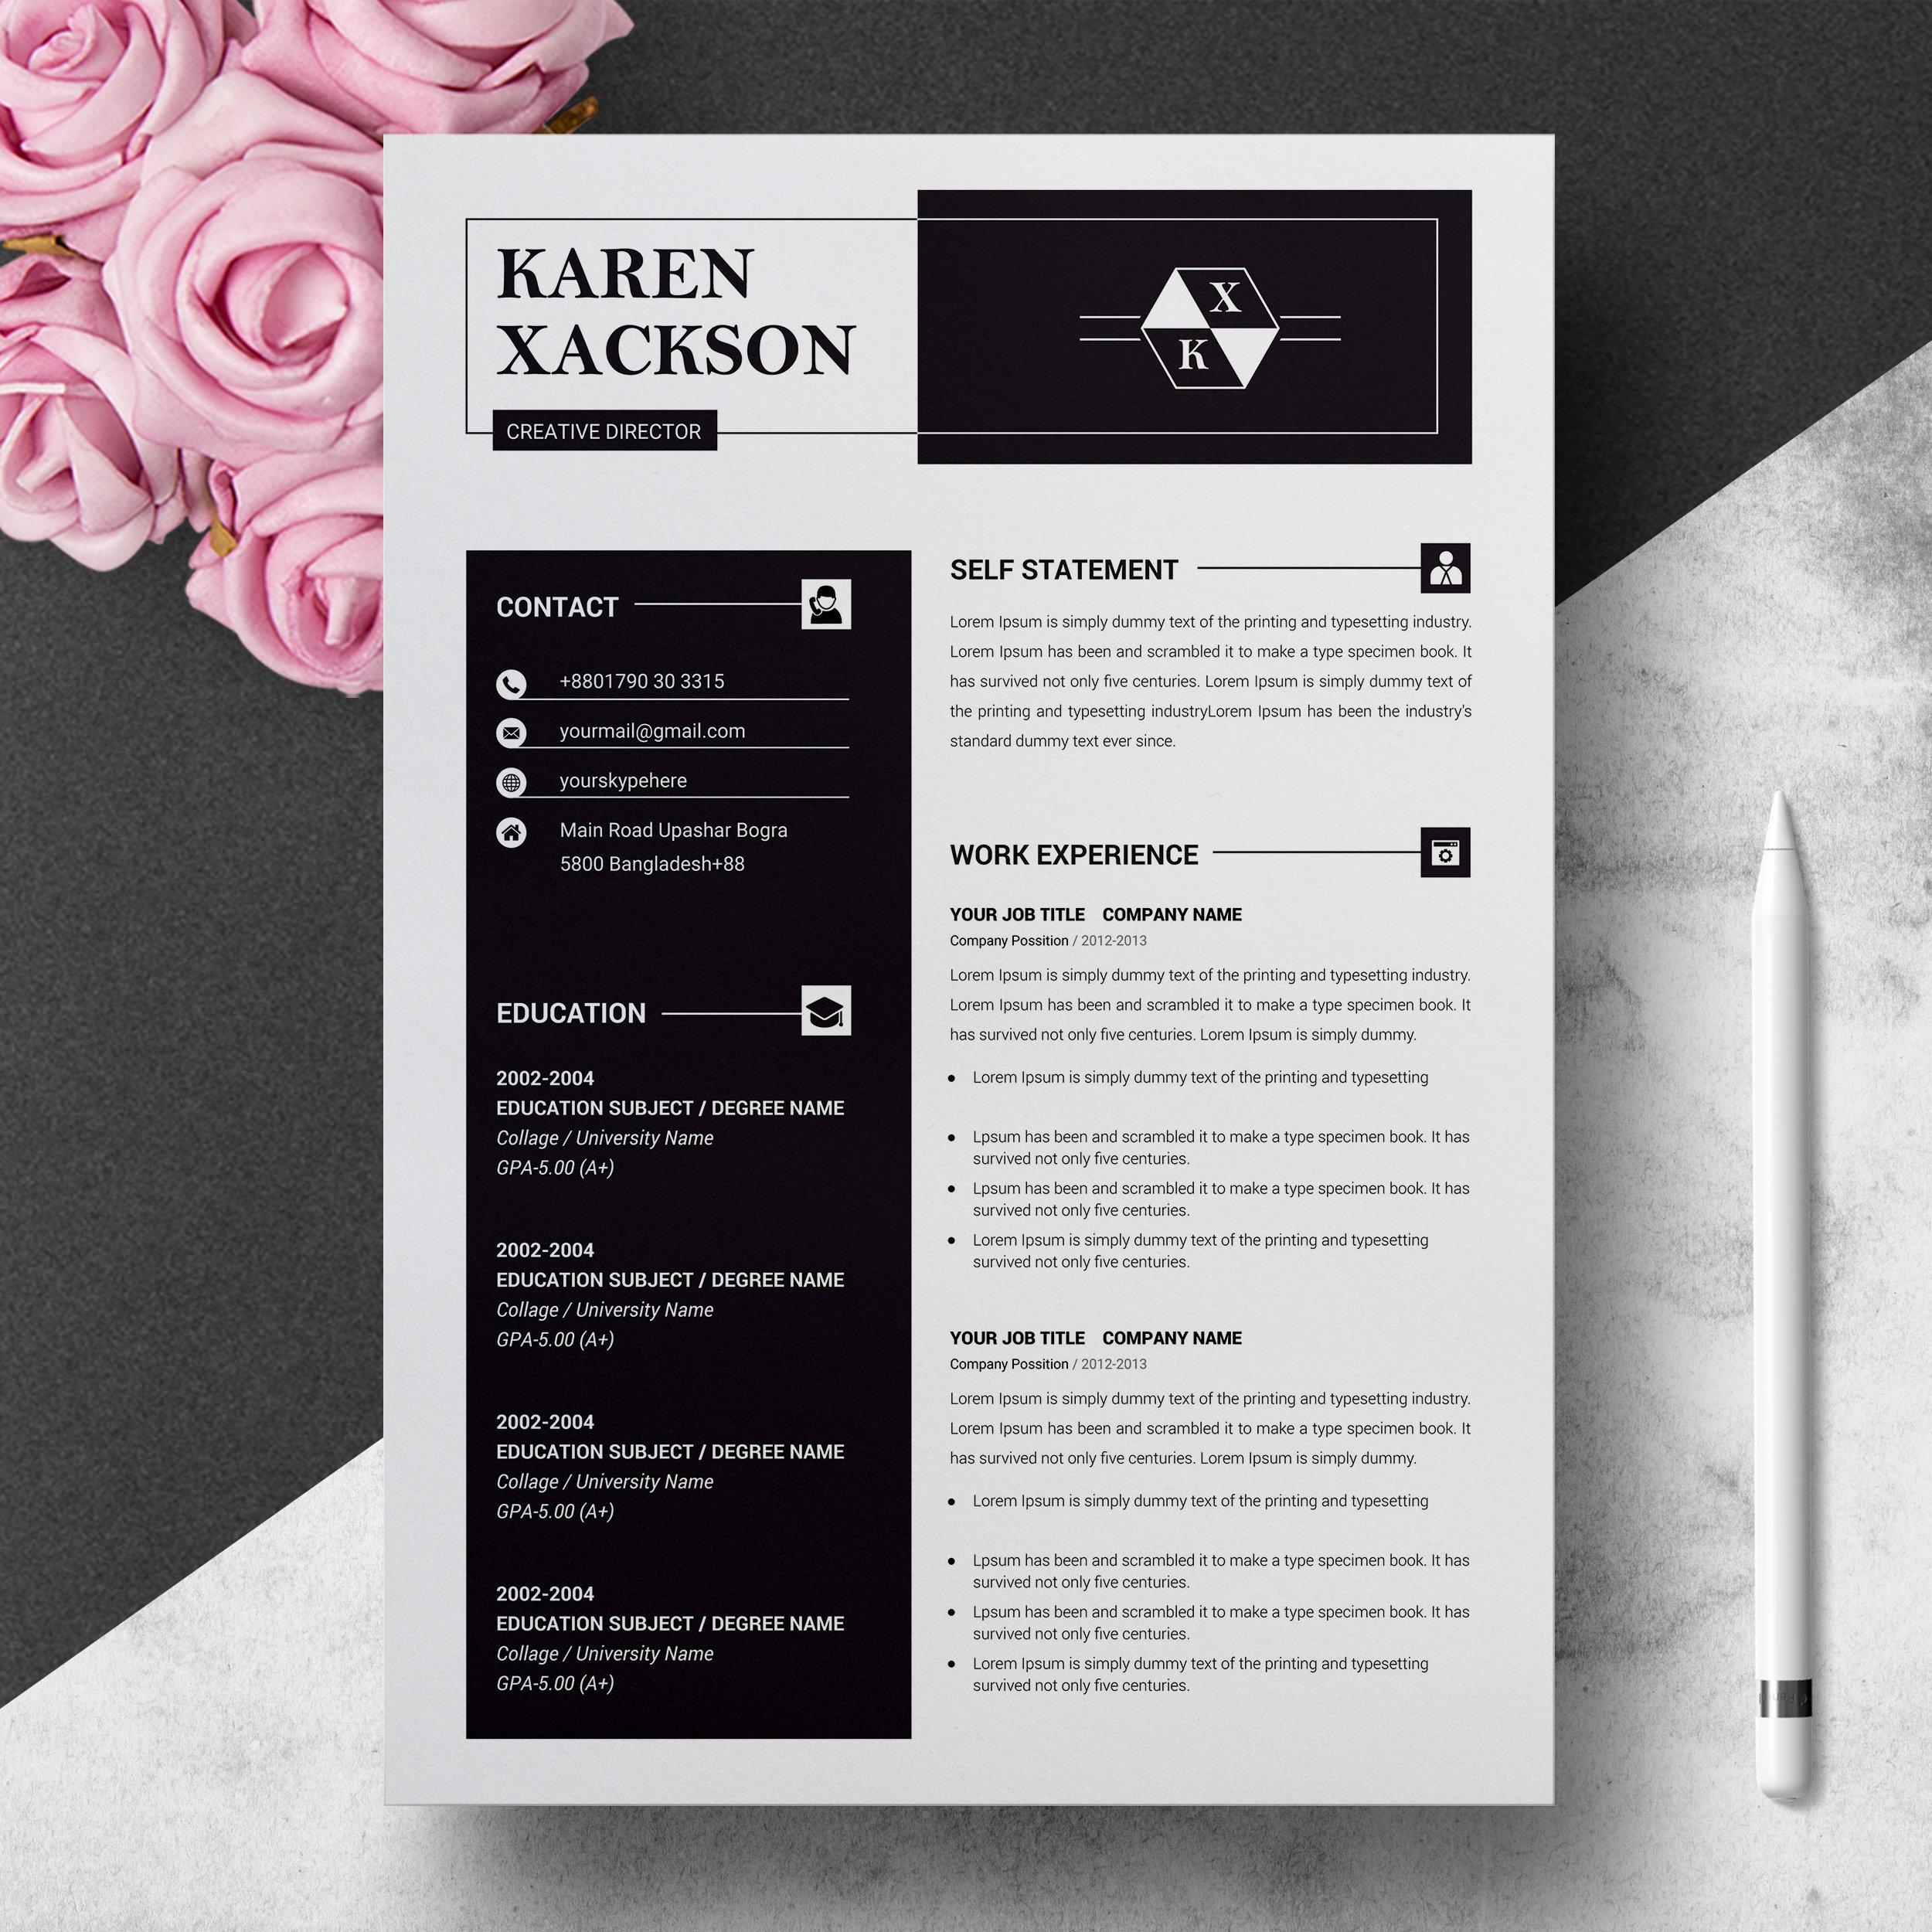 Minimalist Creative Resume Template Modern & Professional | Etsy